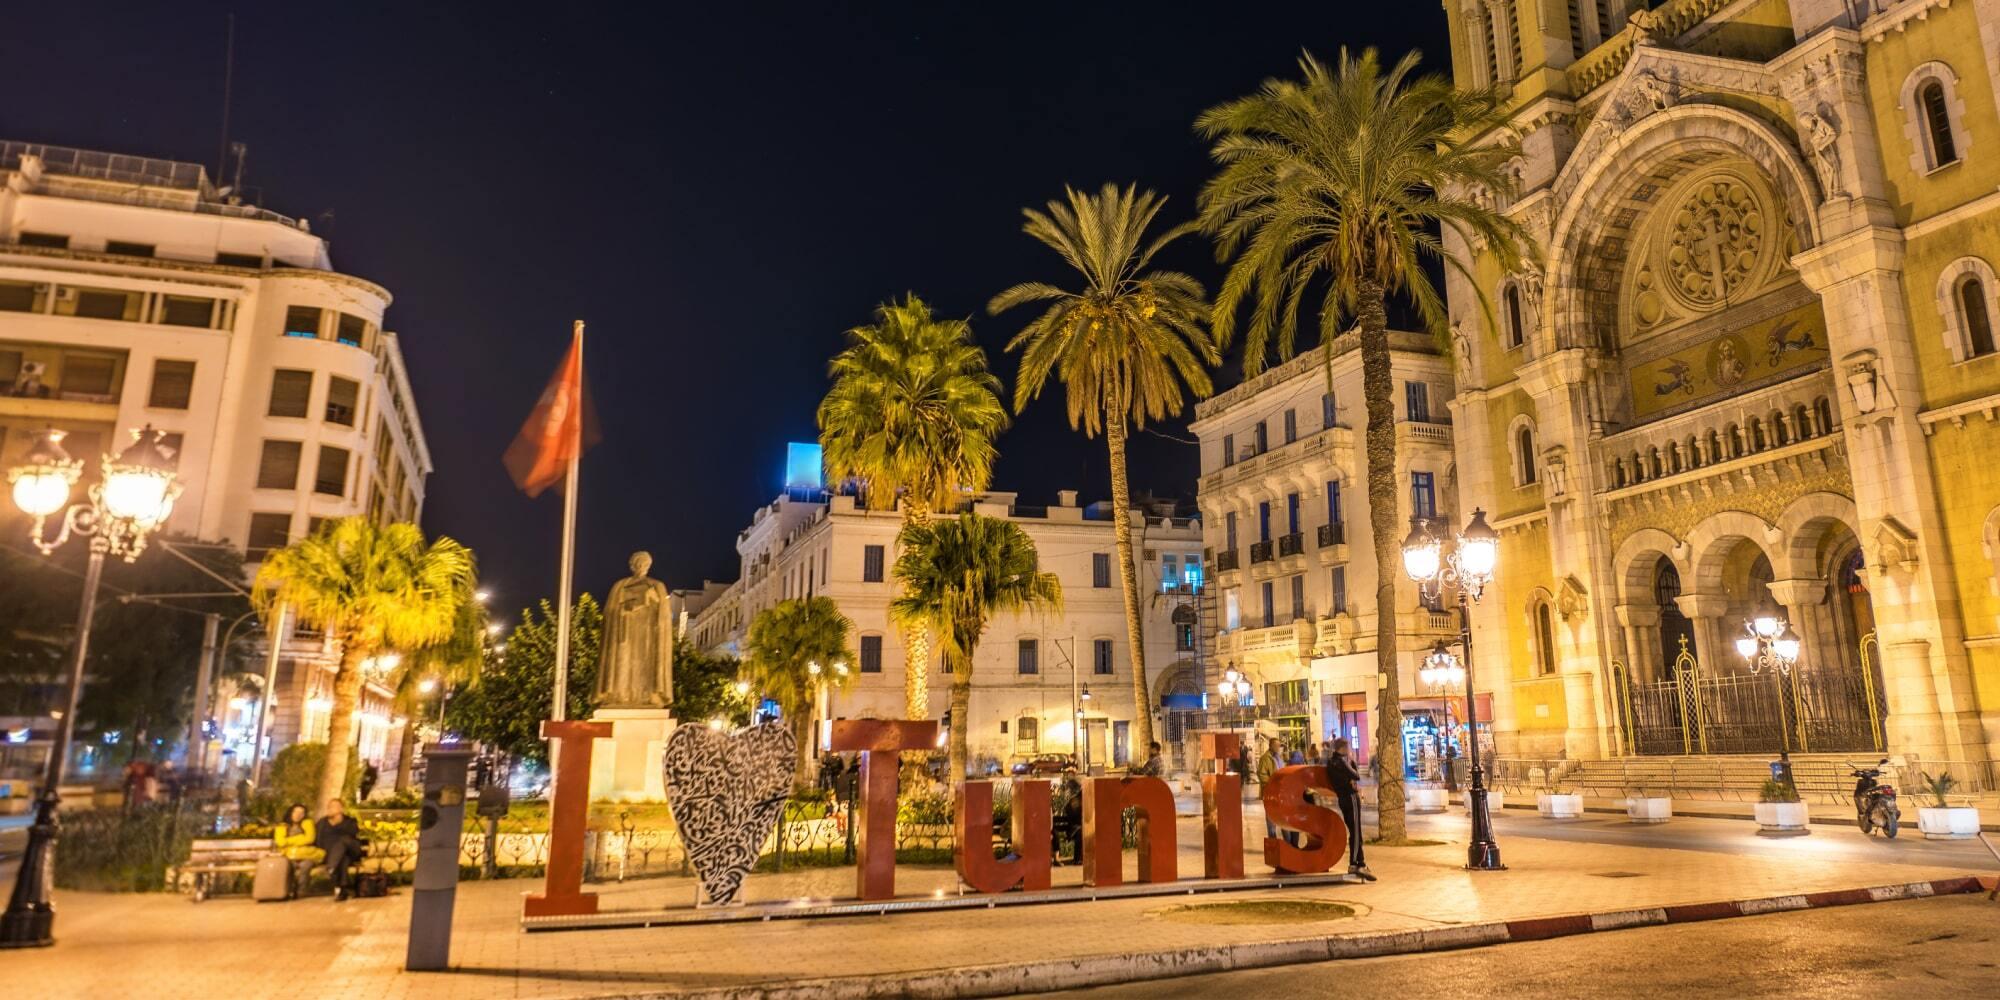 Adservio - Tunis